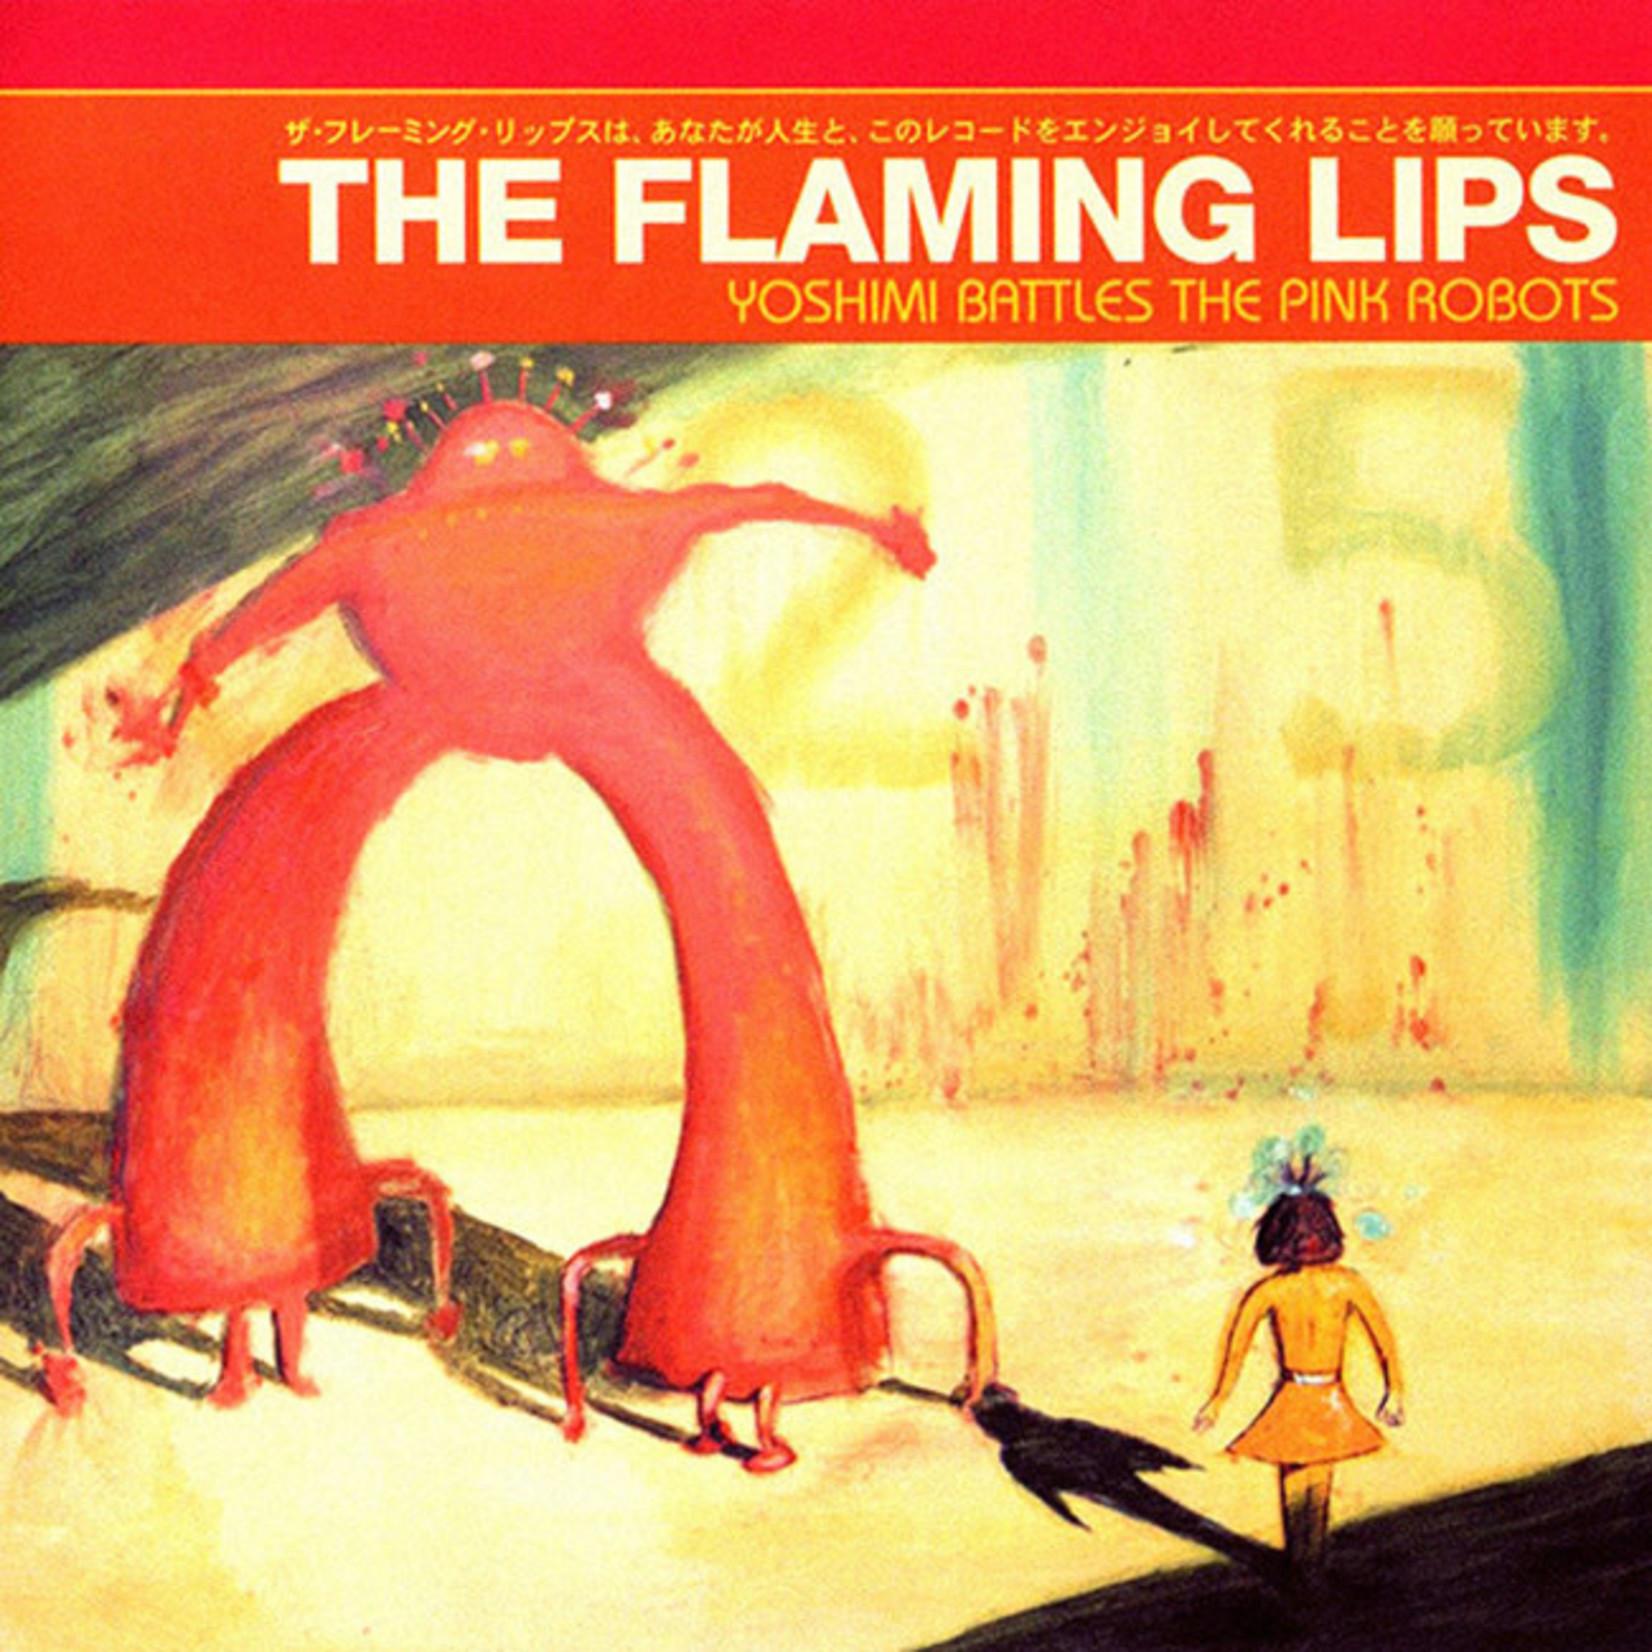 [New] Flaming Lips: Yoshimi Battles The Pink Robots